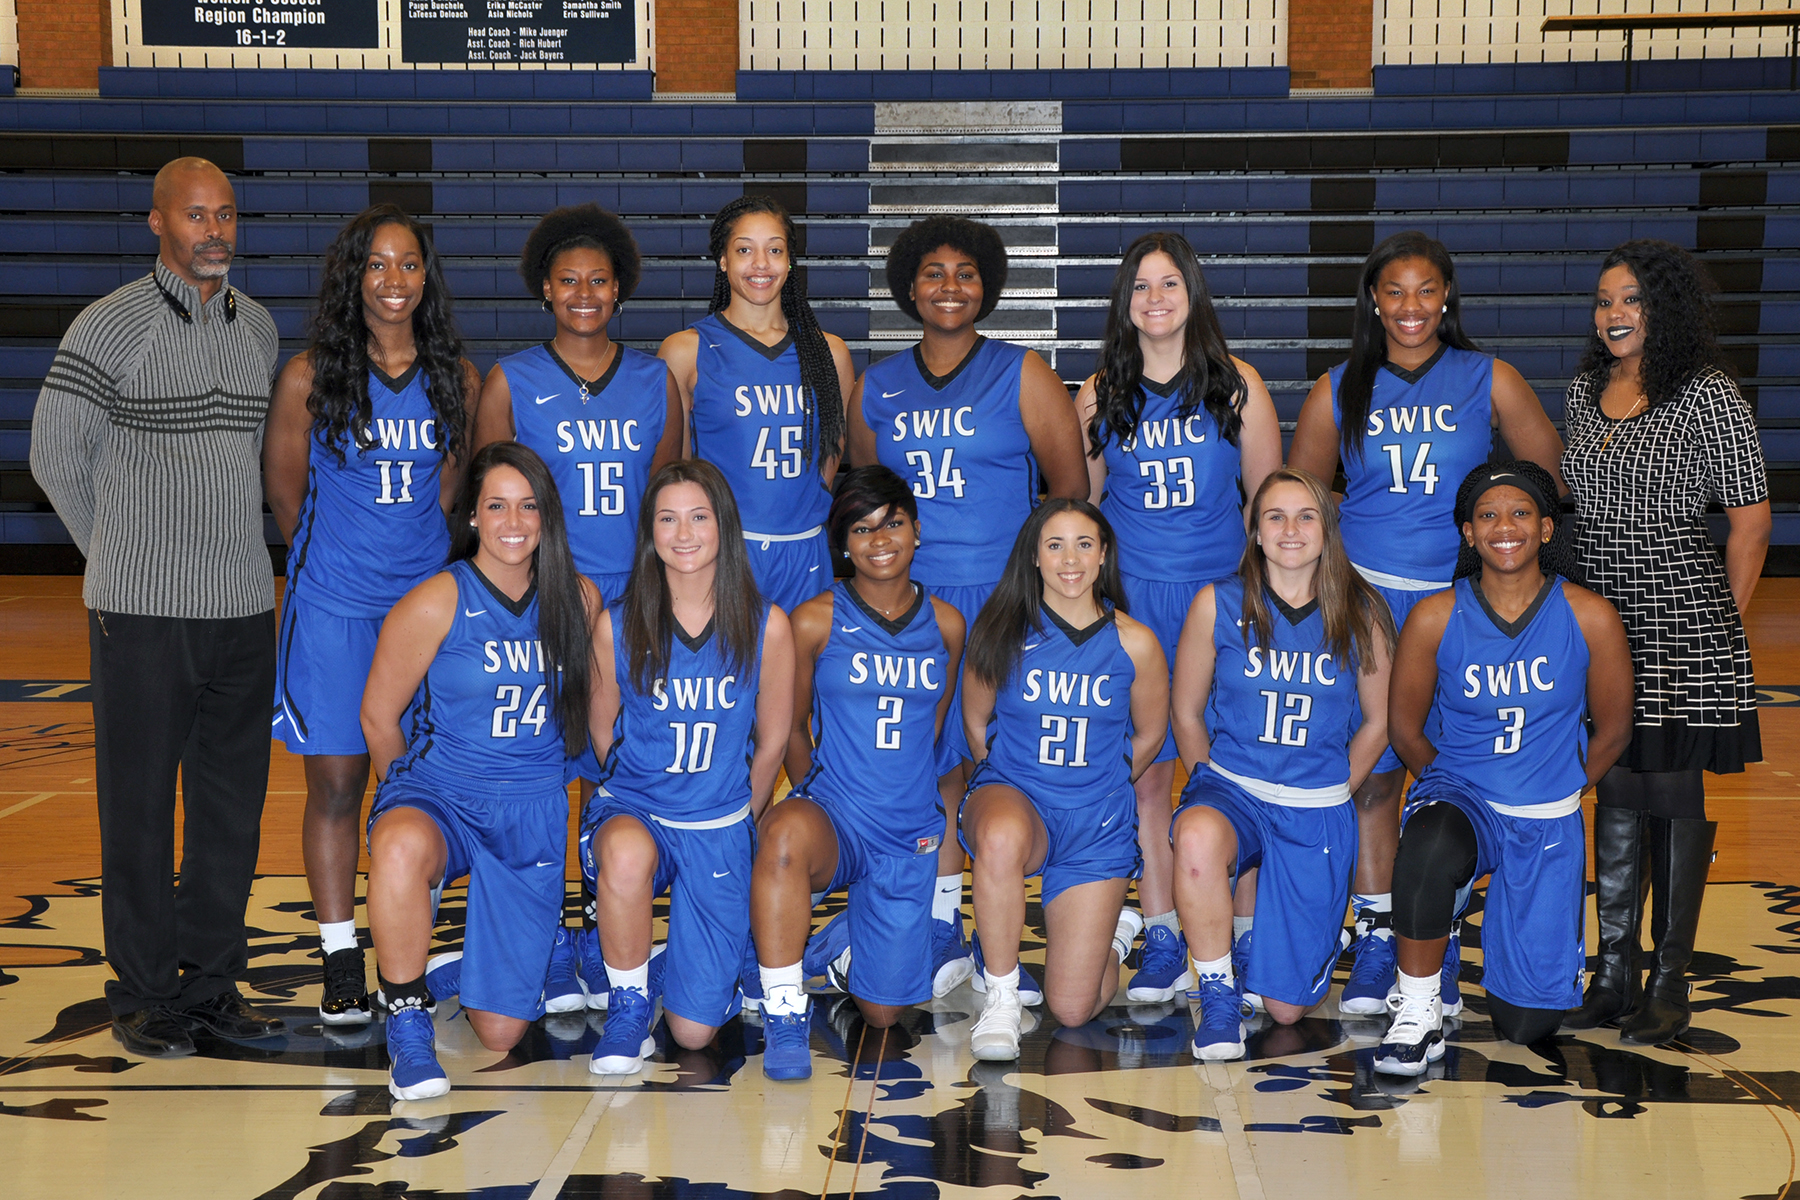 Women S Basketball Schedule Southwestern Illinois College